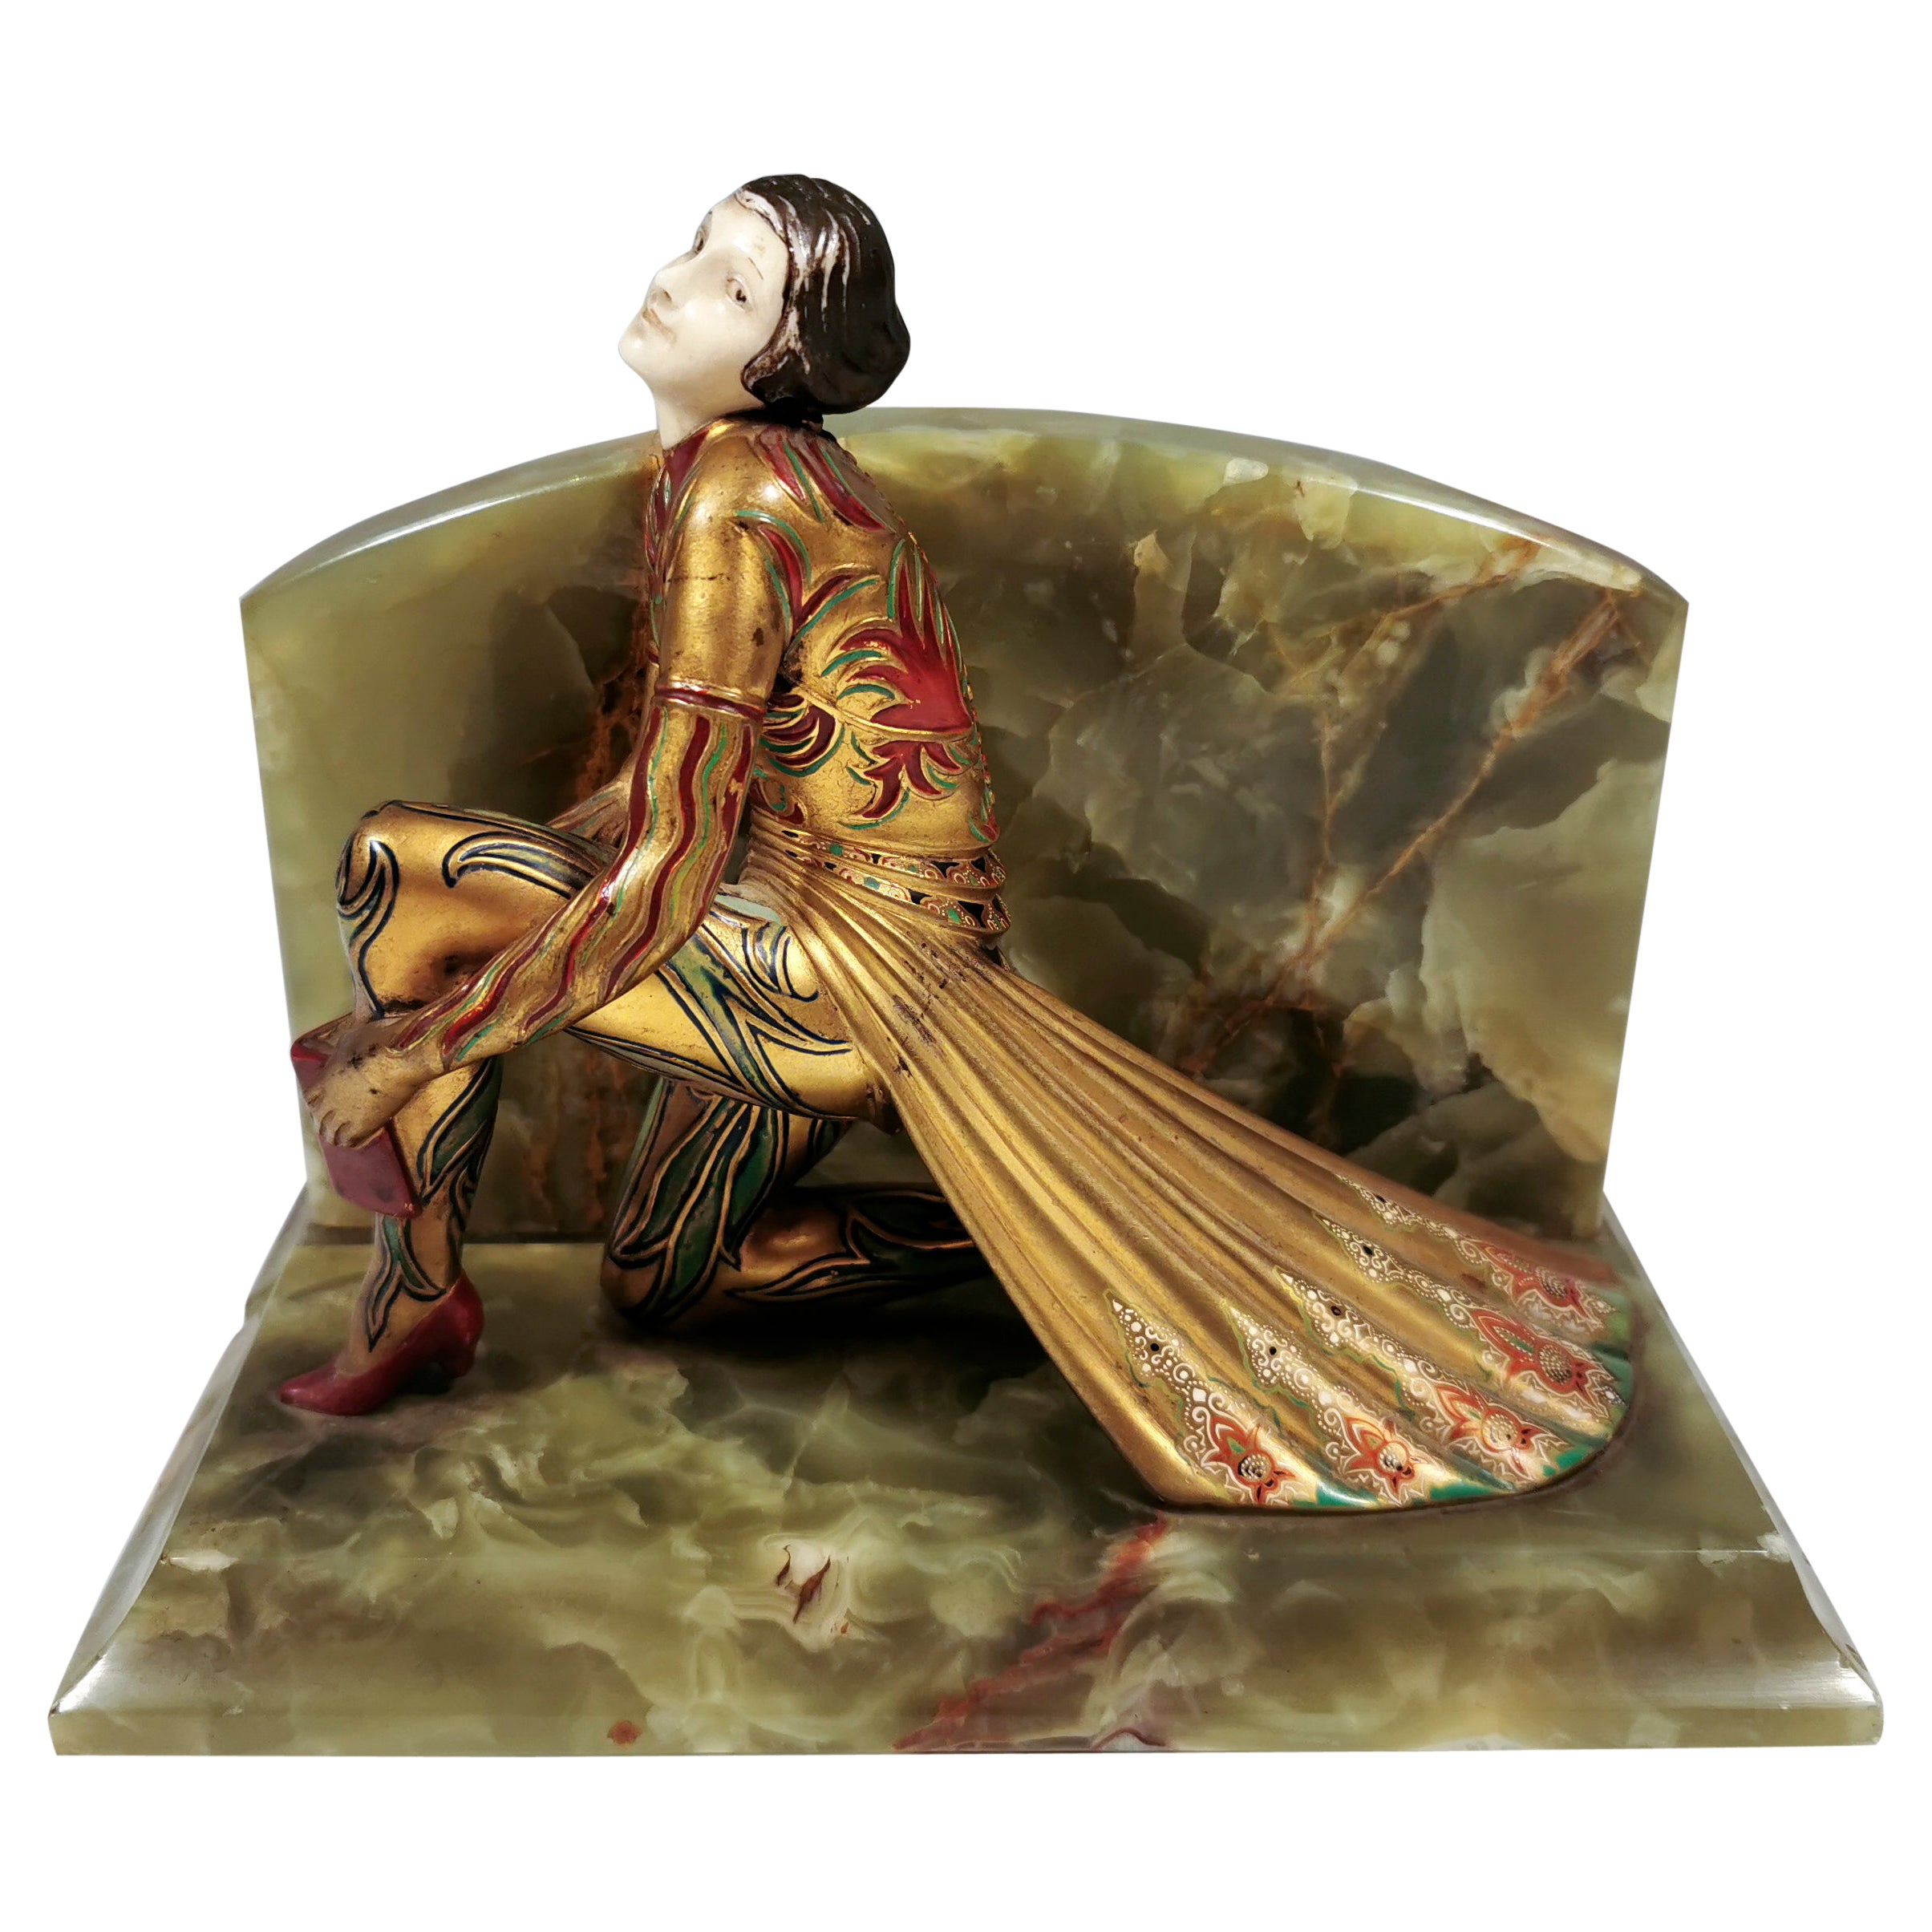 Viennese Bronze 'Fancy Dancer' On Onyx Base as a Bookend, by Gerdago, ca 1925